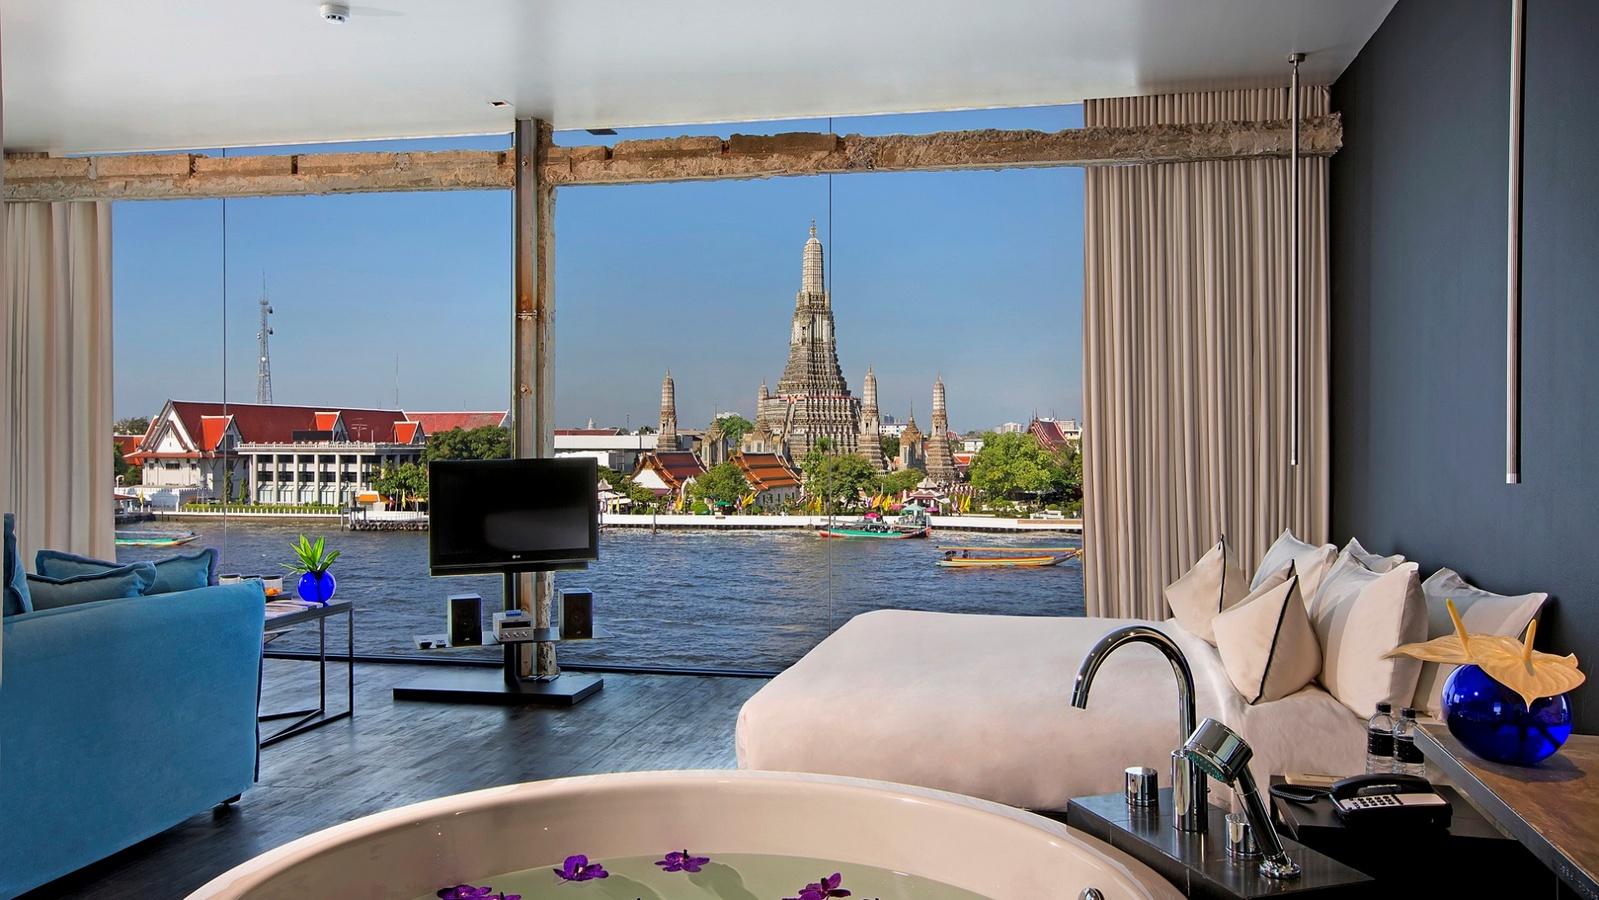 9 h tels de luxe riverside bangkok pour contempler la chao praya river silencio. Black Bedroom Furniture Sets. Home Design Ideas